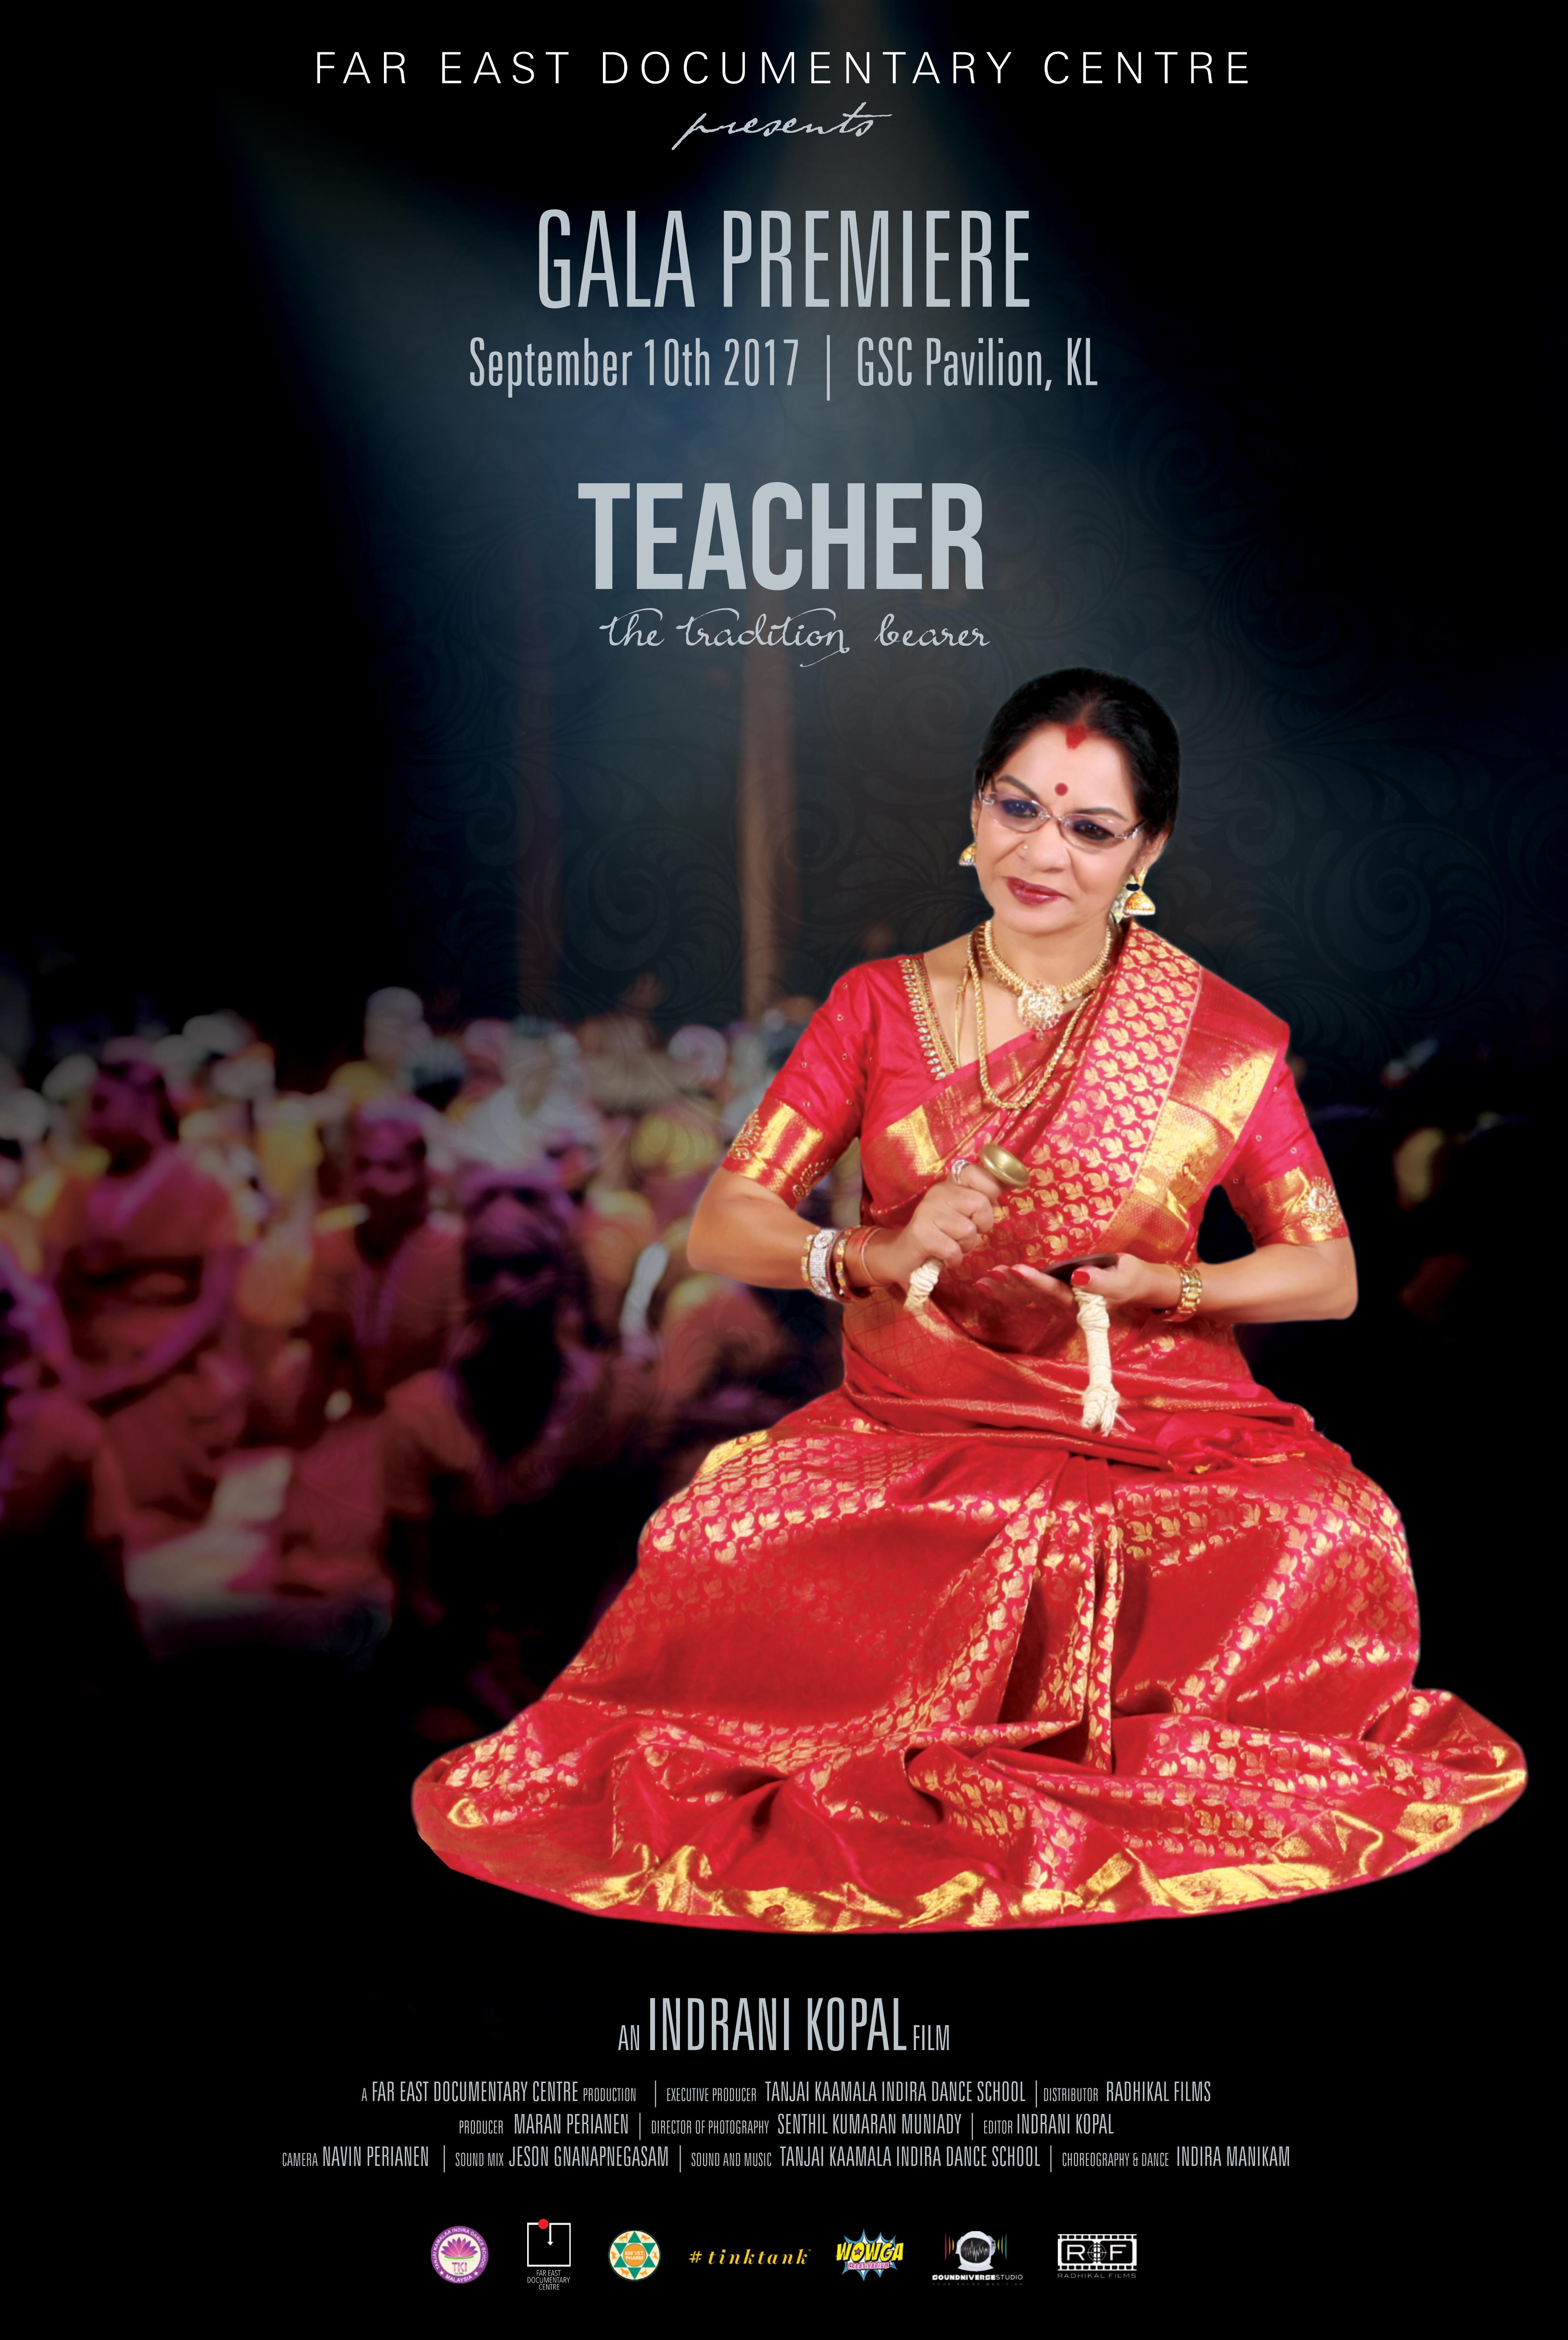 Teacher, The Tradition Bearer (Malaysia, 2017, 48-min)